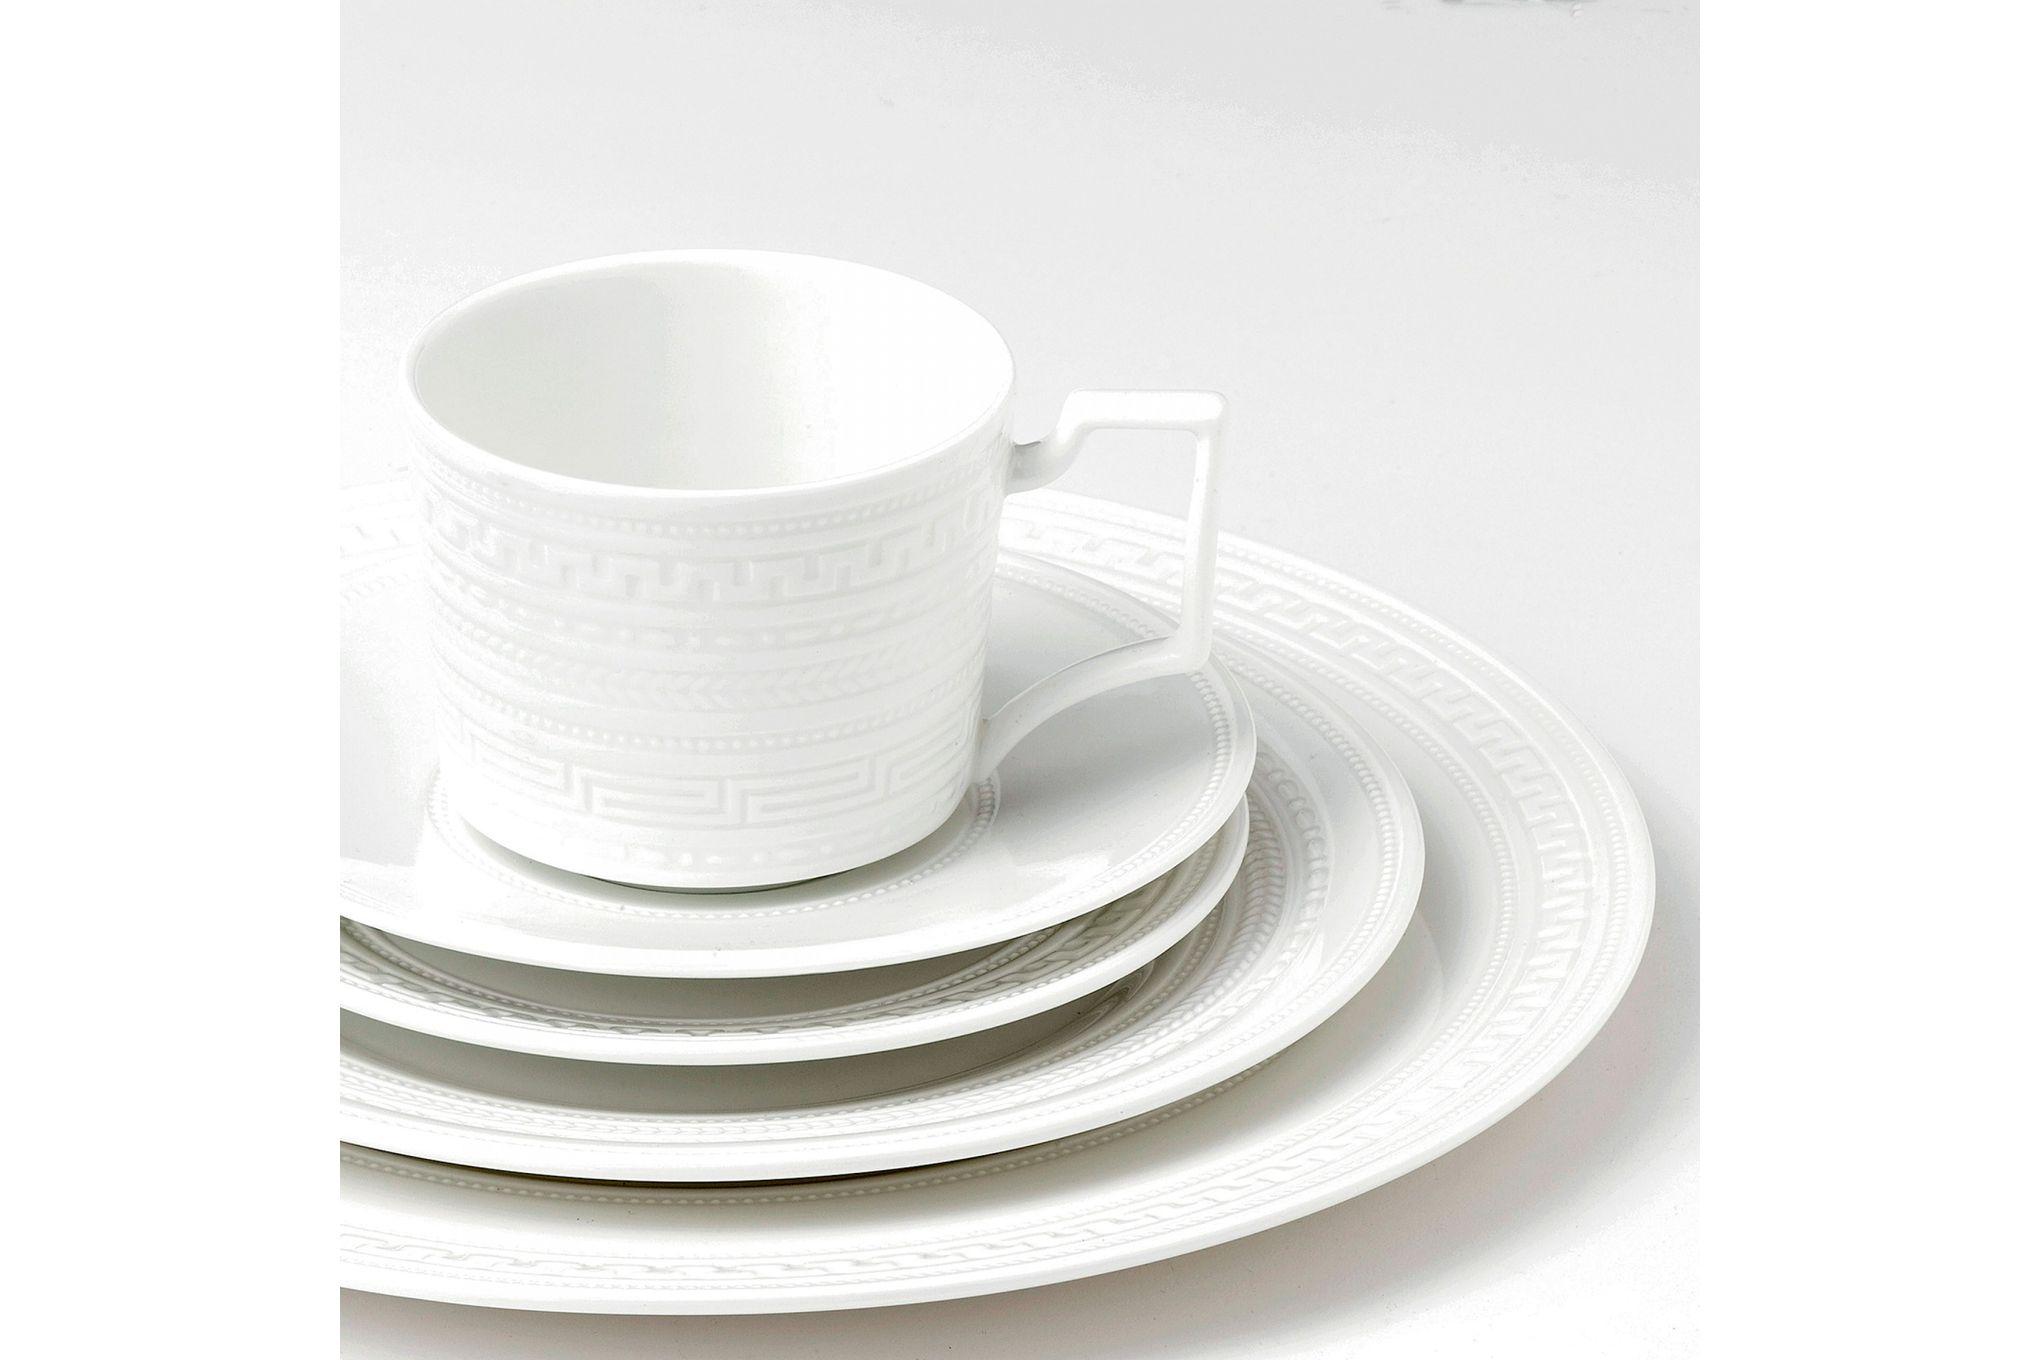 Wedgwood Intaglio Breakfast / Salad / Luncheon Plate 23cm thumb 2